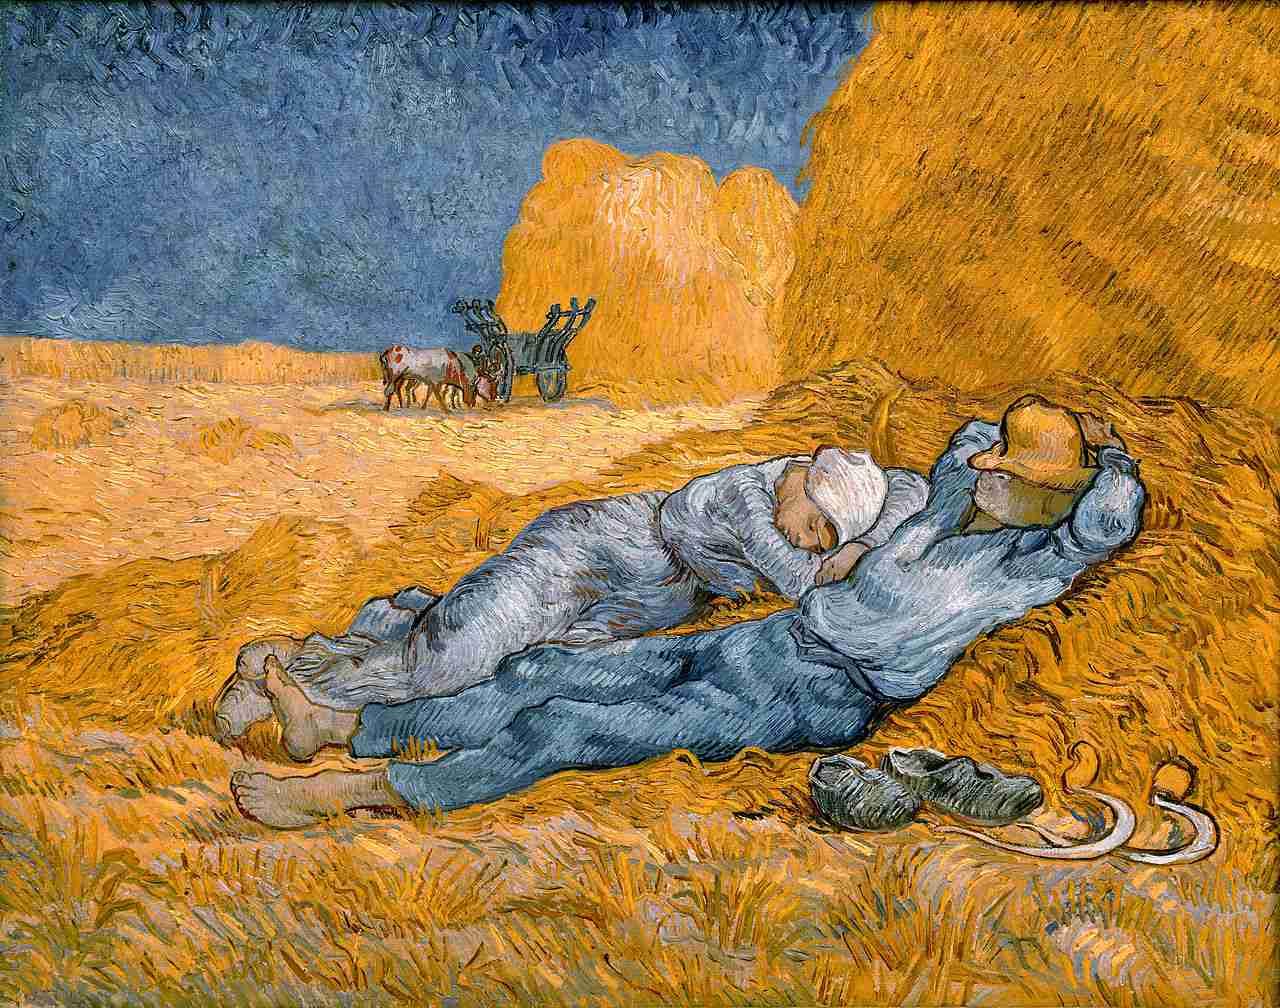 Vincent van Gogh, Siesta